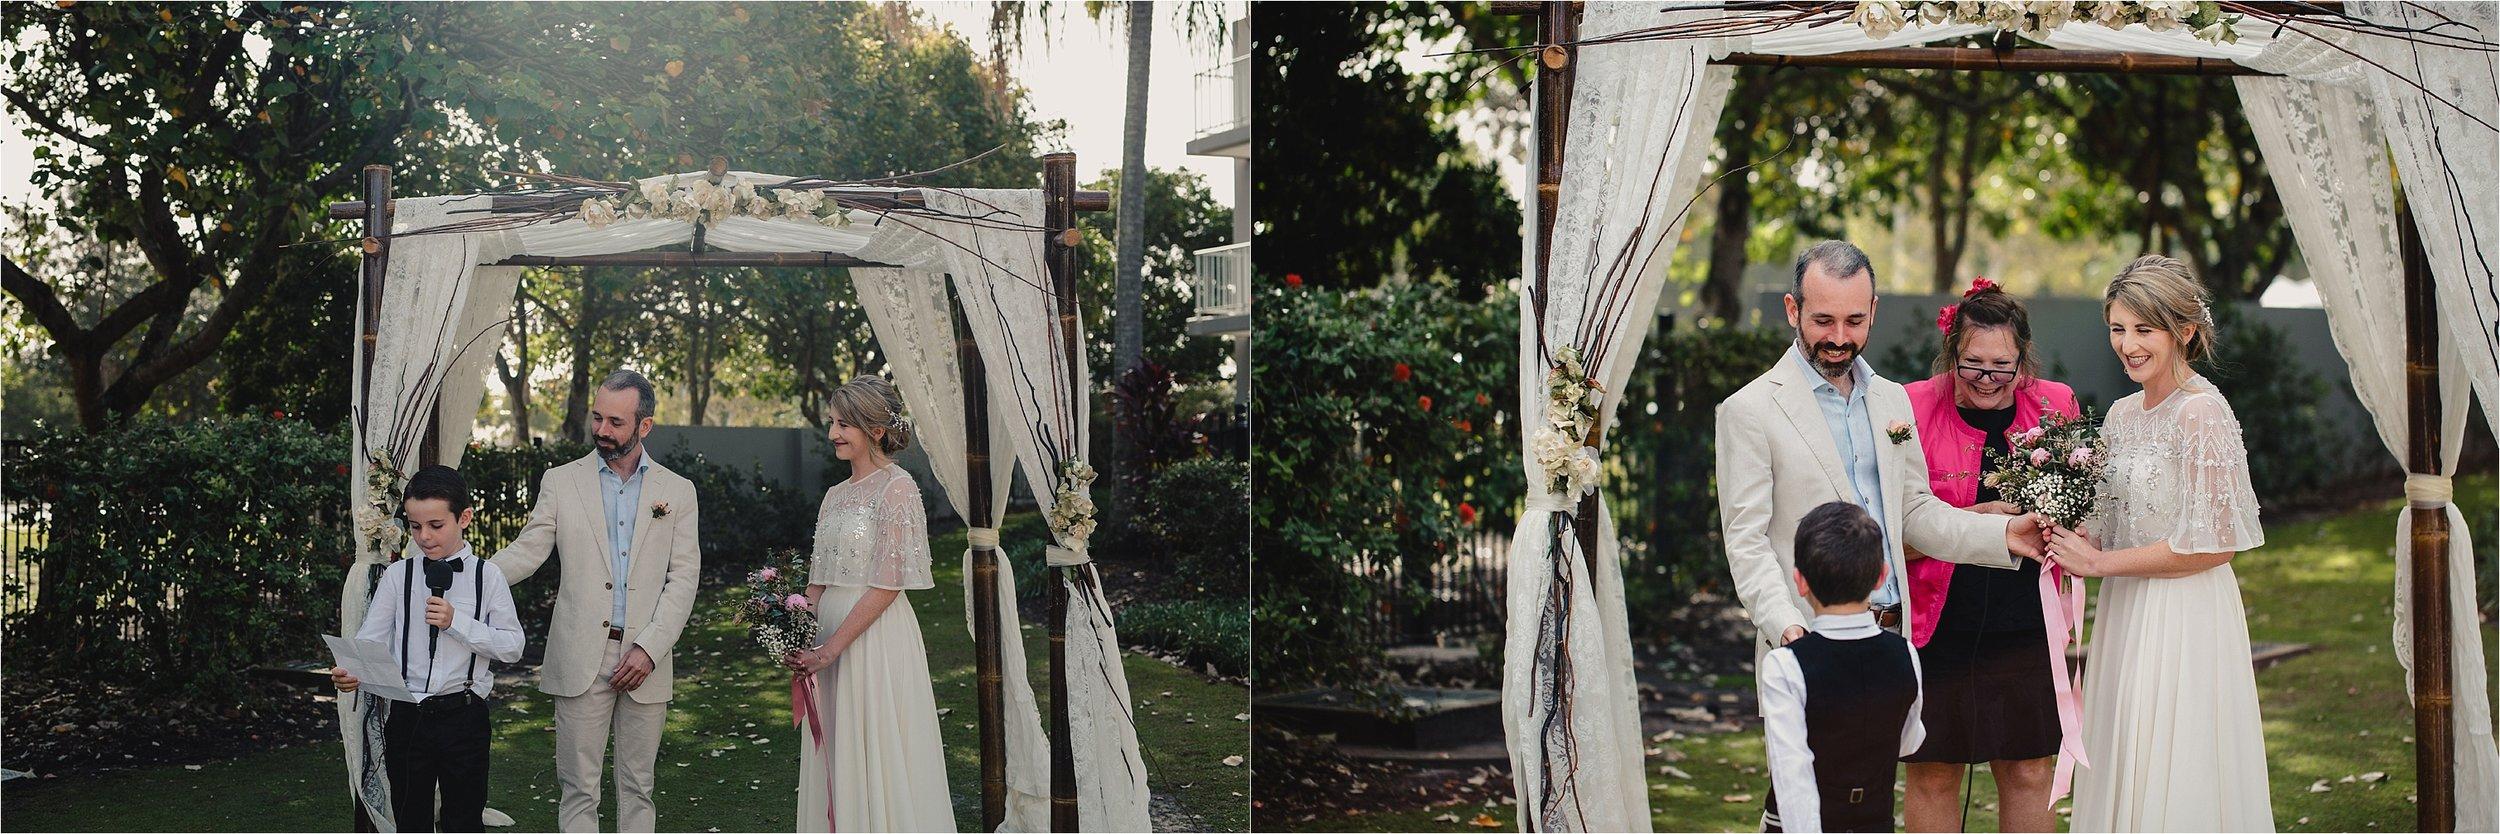 Salt - Wedding - Ceremony - Gold - Coast - Wedding - Photographers_0010.jpg